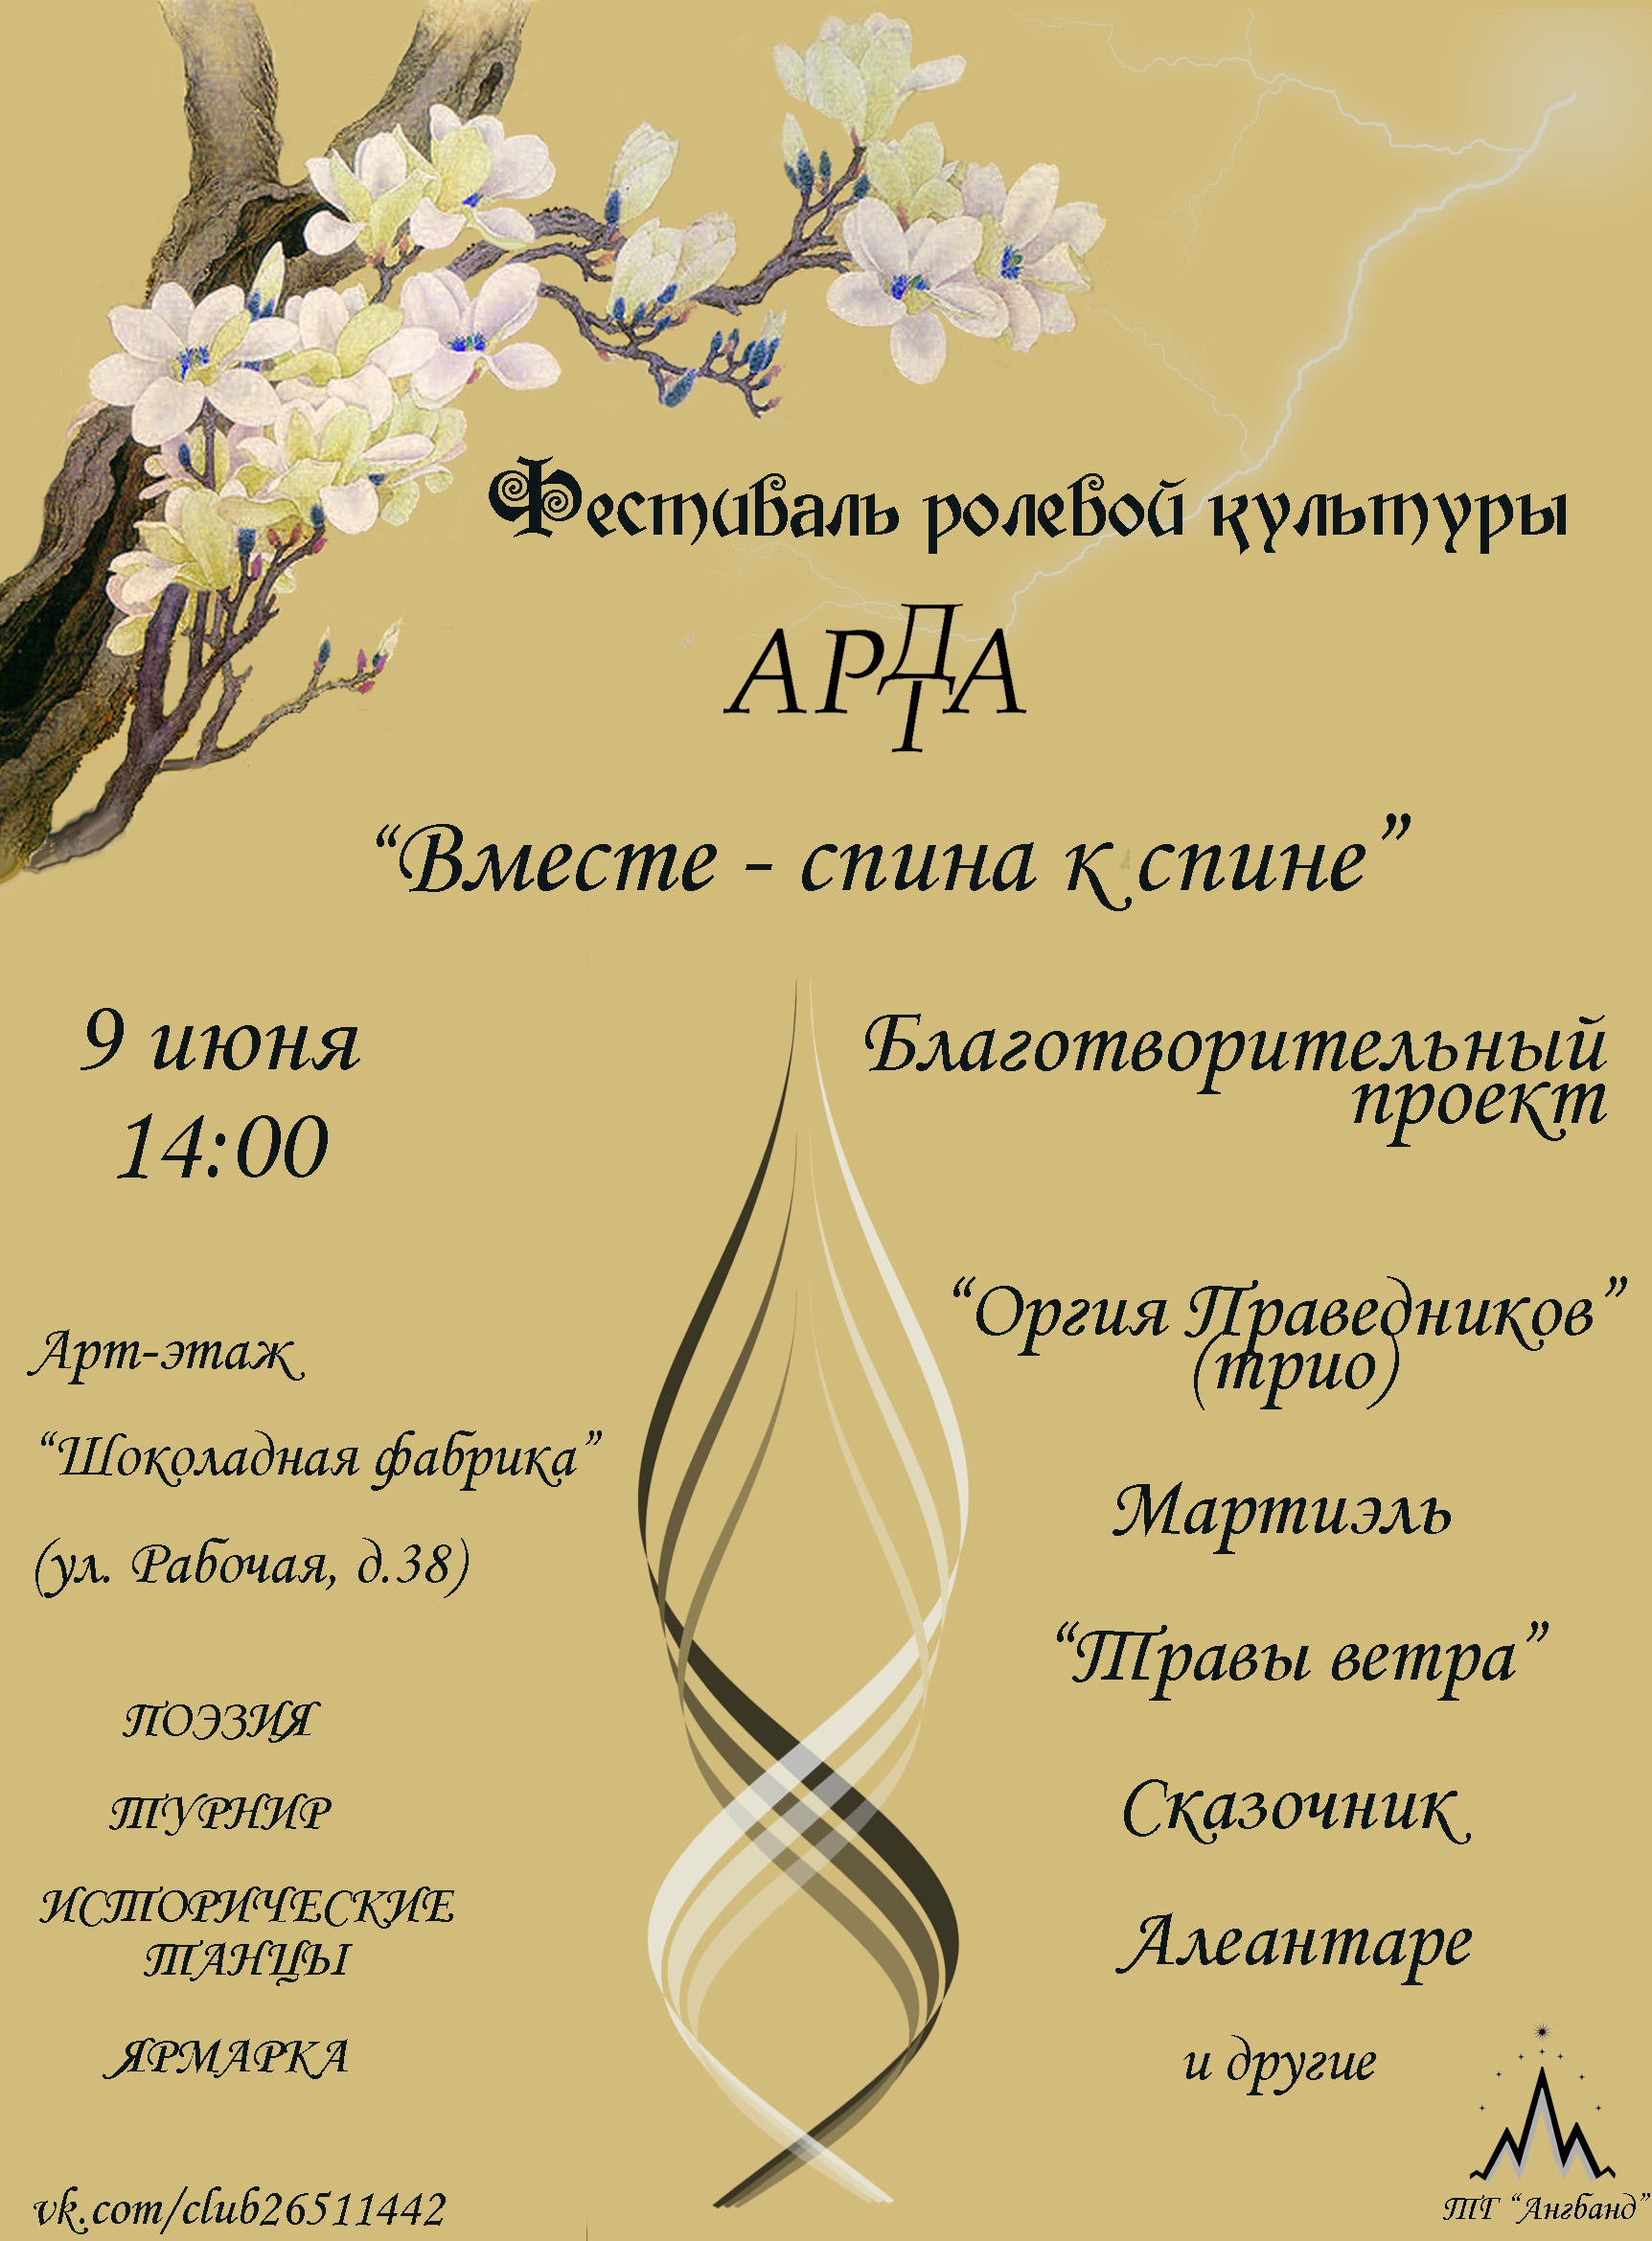 Афиша 9 июня